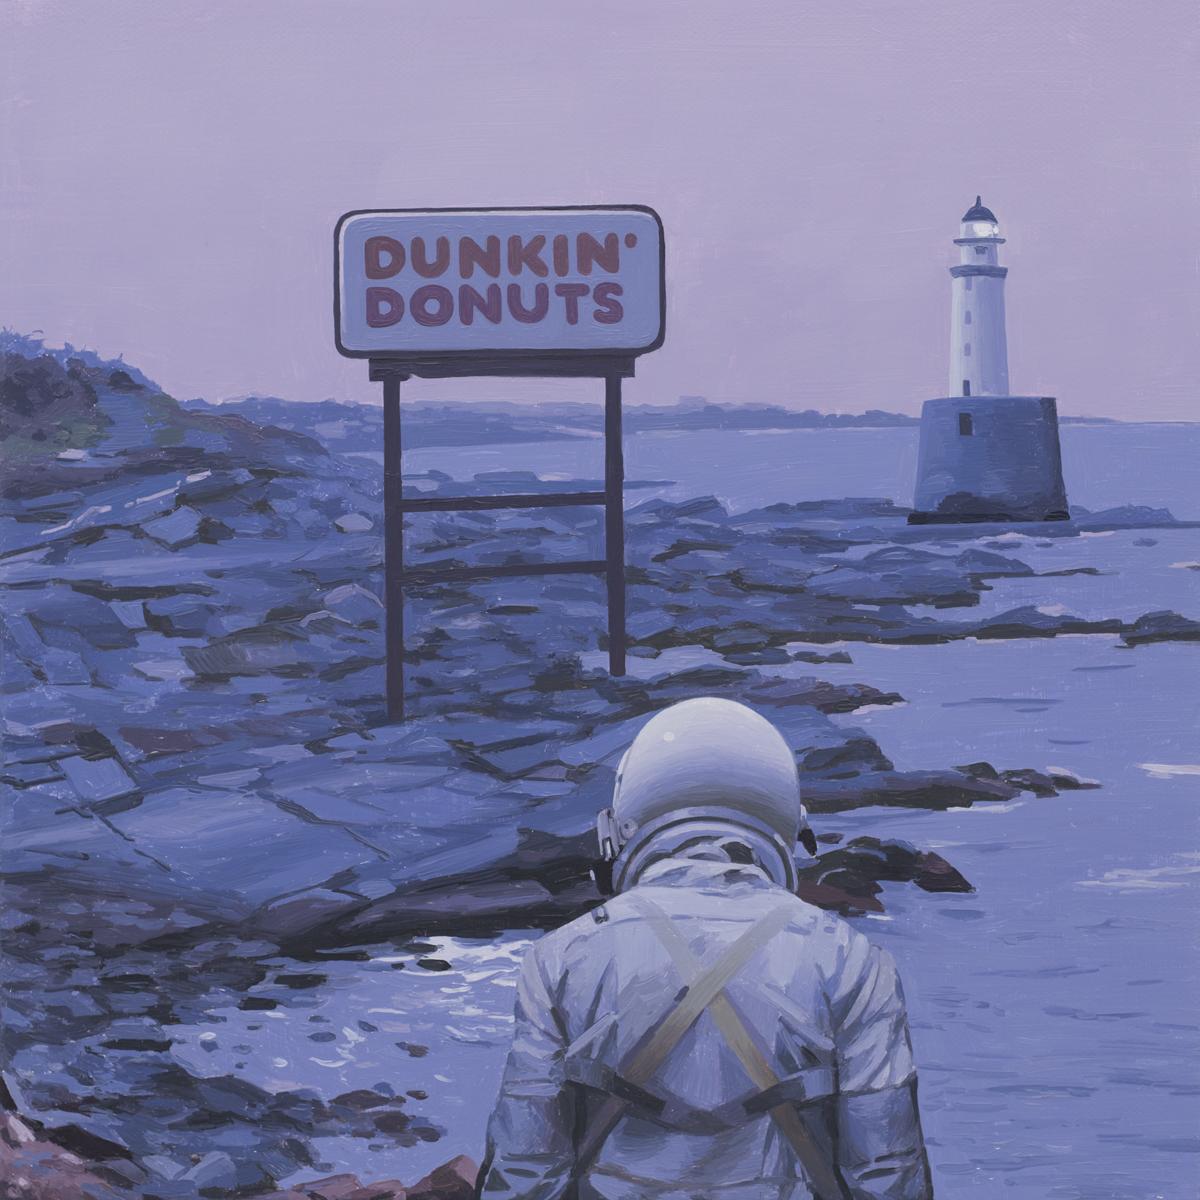 Dunkies